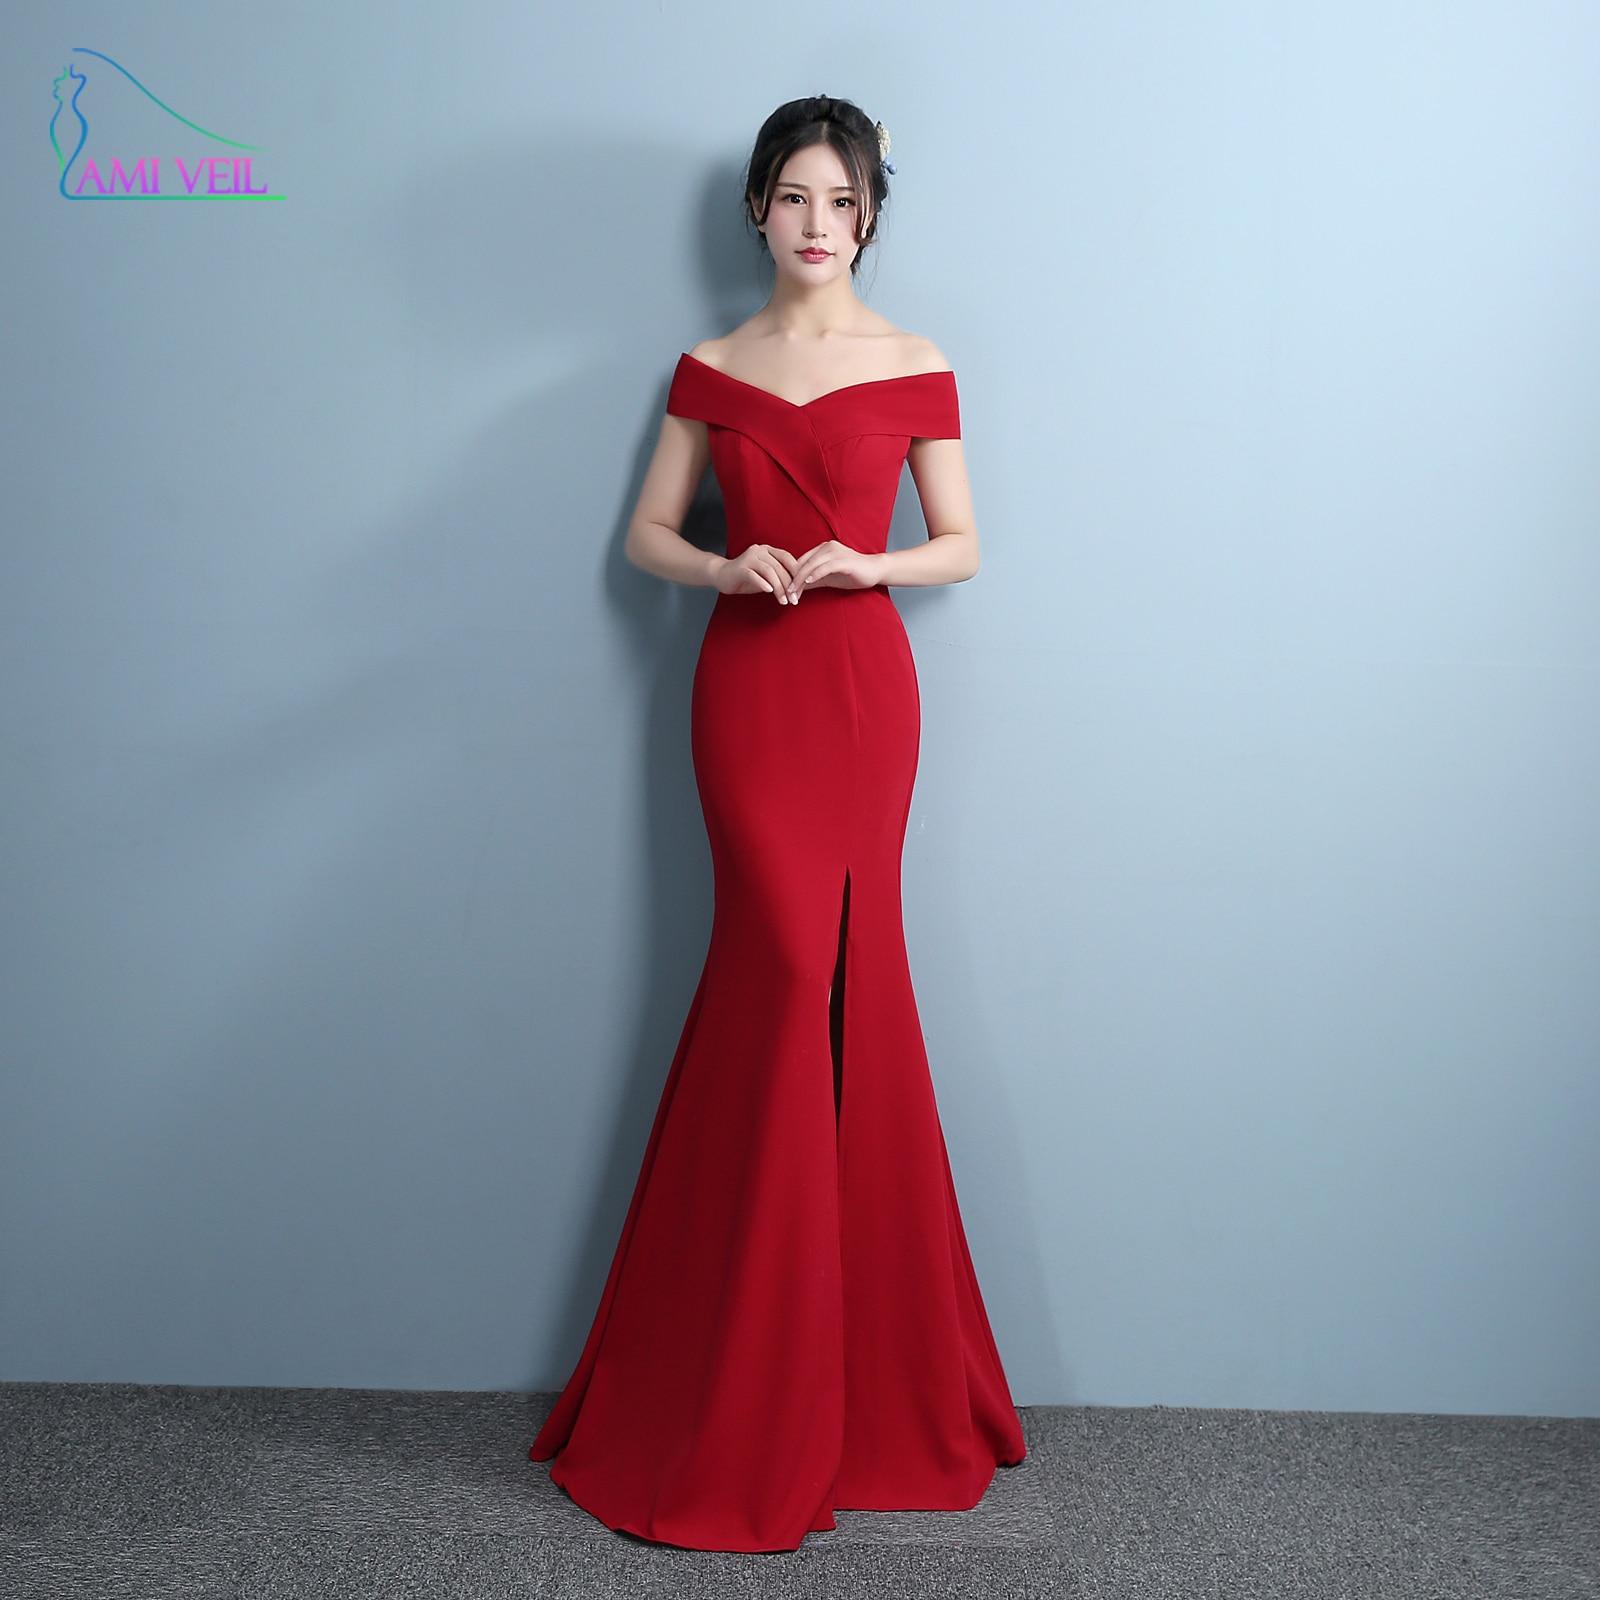 Gala Dresses Reviews - Online Shopping Gala Dresses Reviews on ...